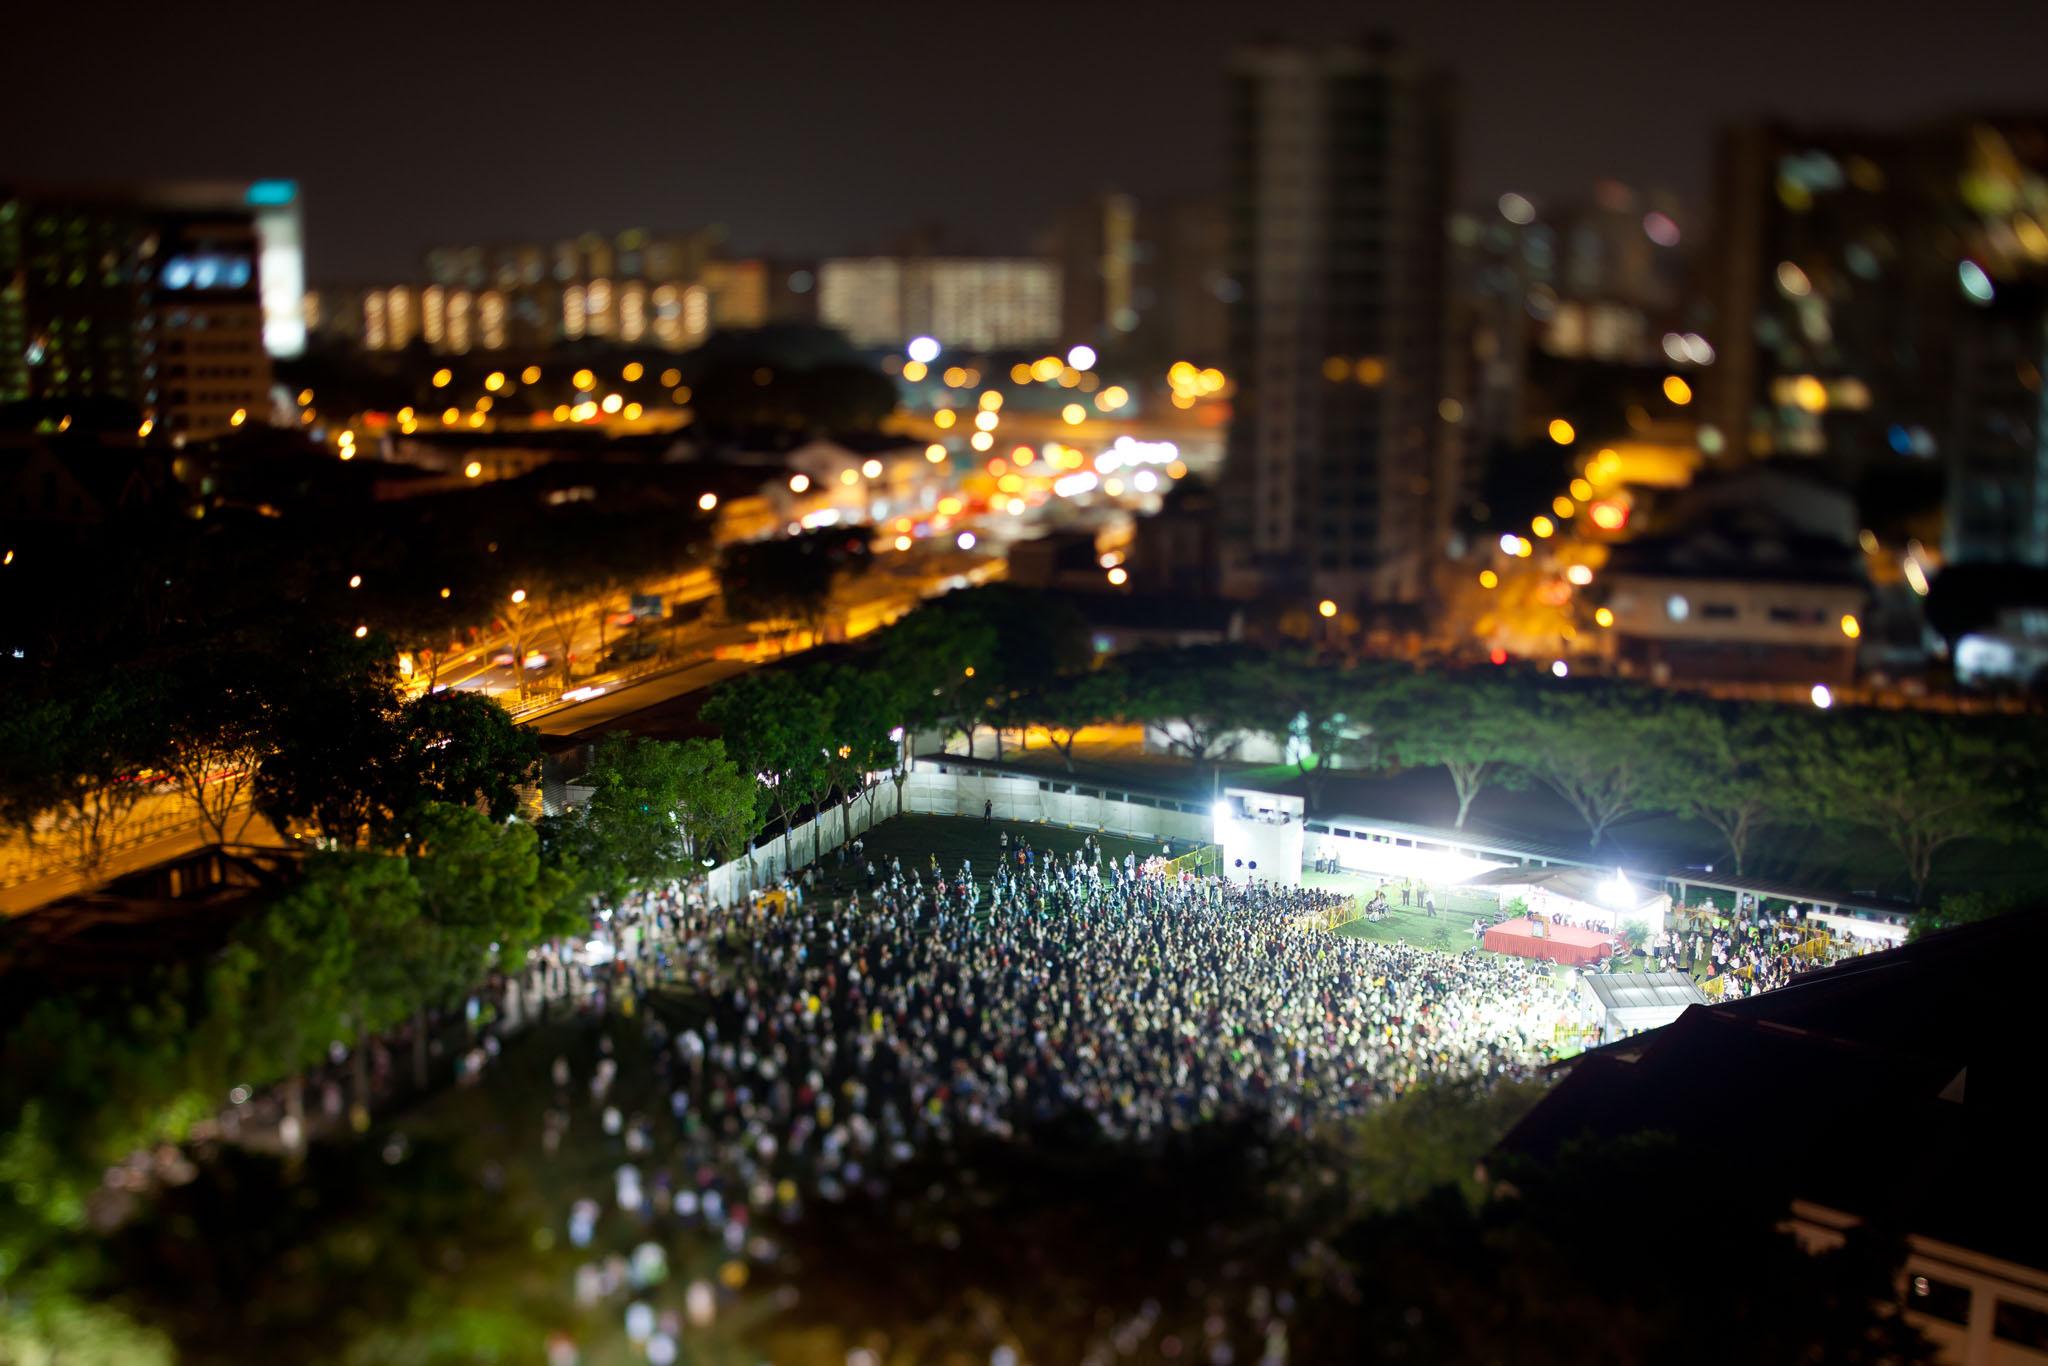 singapore-commercial-photographer-editorial-documentary-tiltshift-singaplural-zakaria-zainal-09.jpg